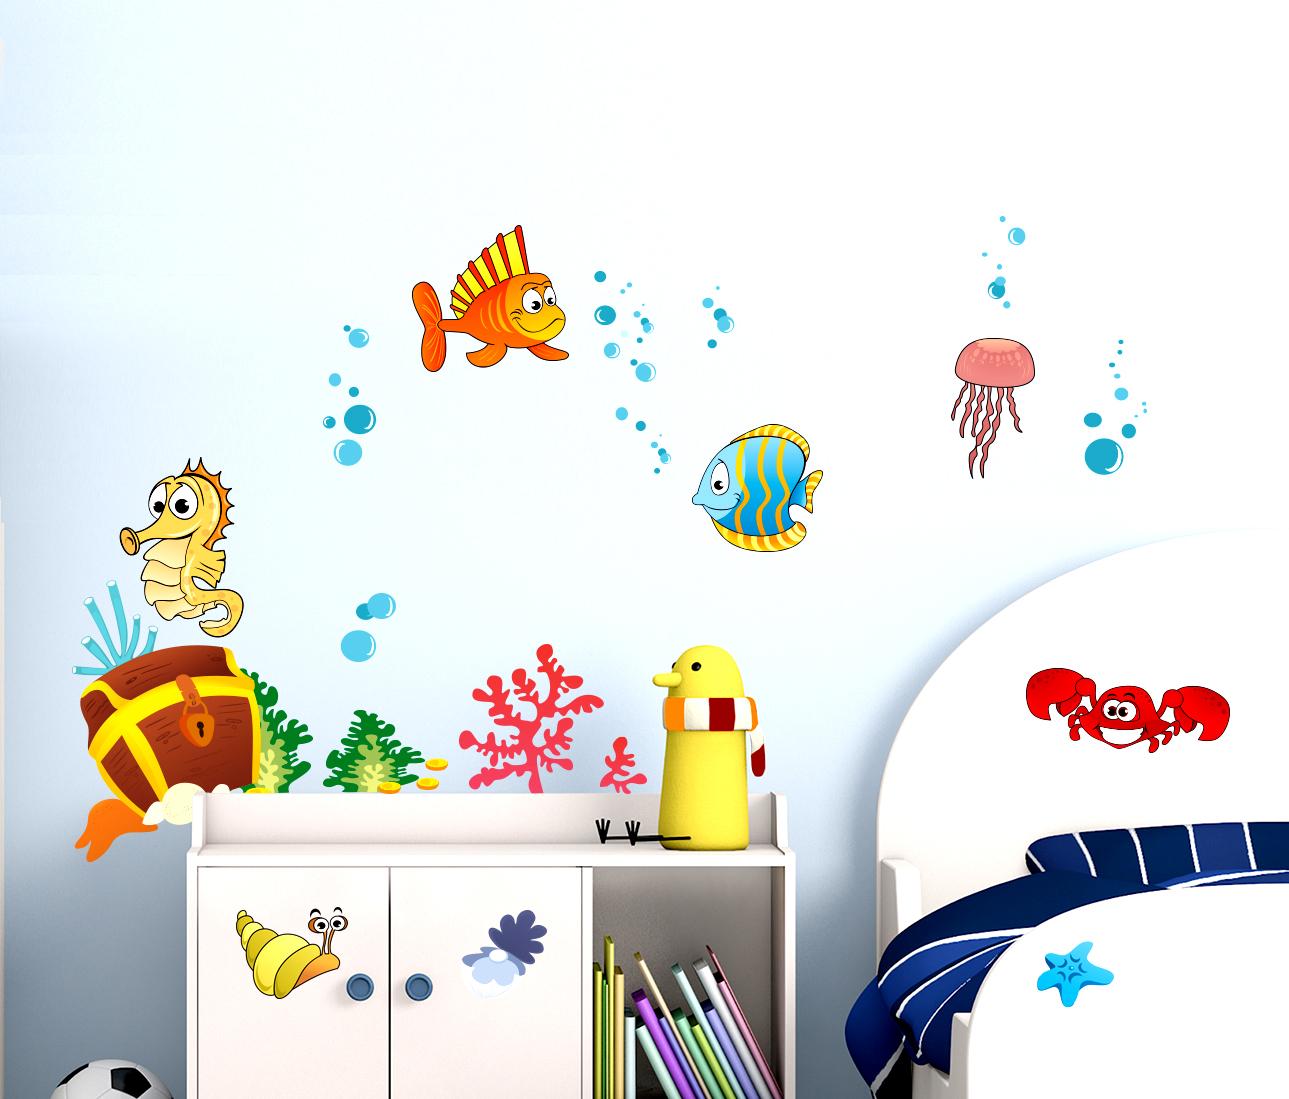 Stickerdesign adesivi murali bambini cameretta bambini - Adesivi camera bambini ...